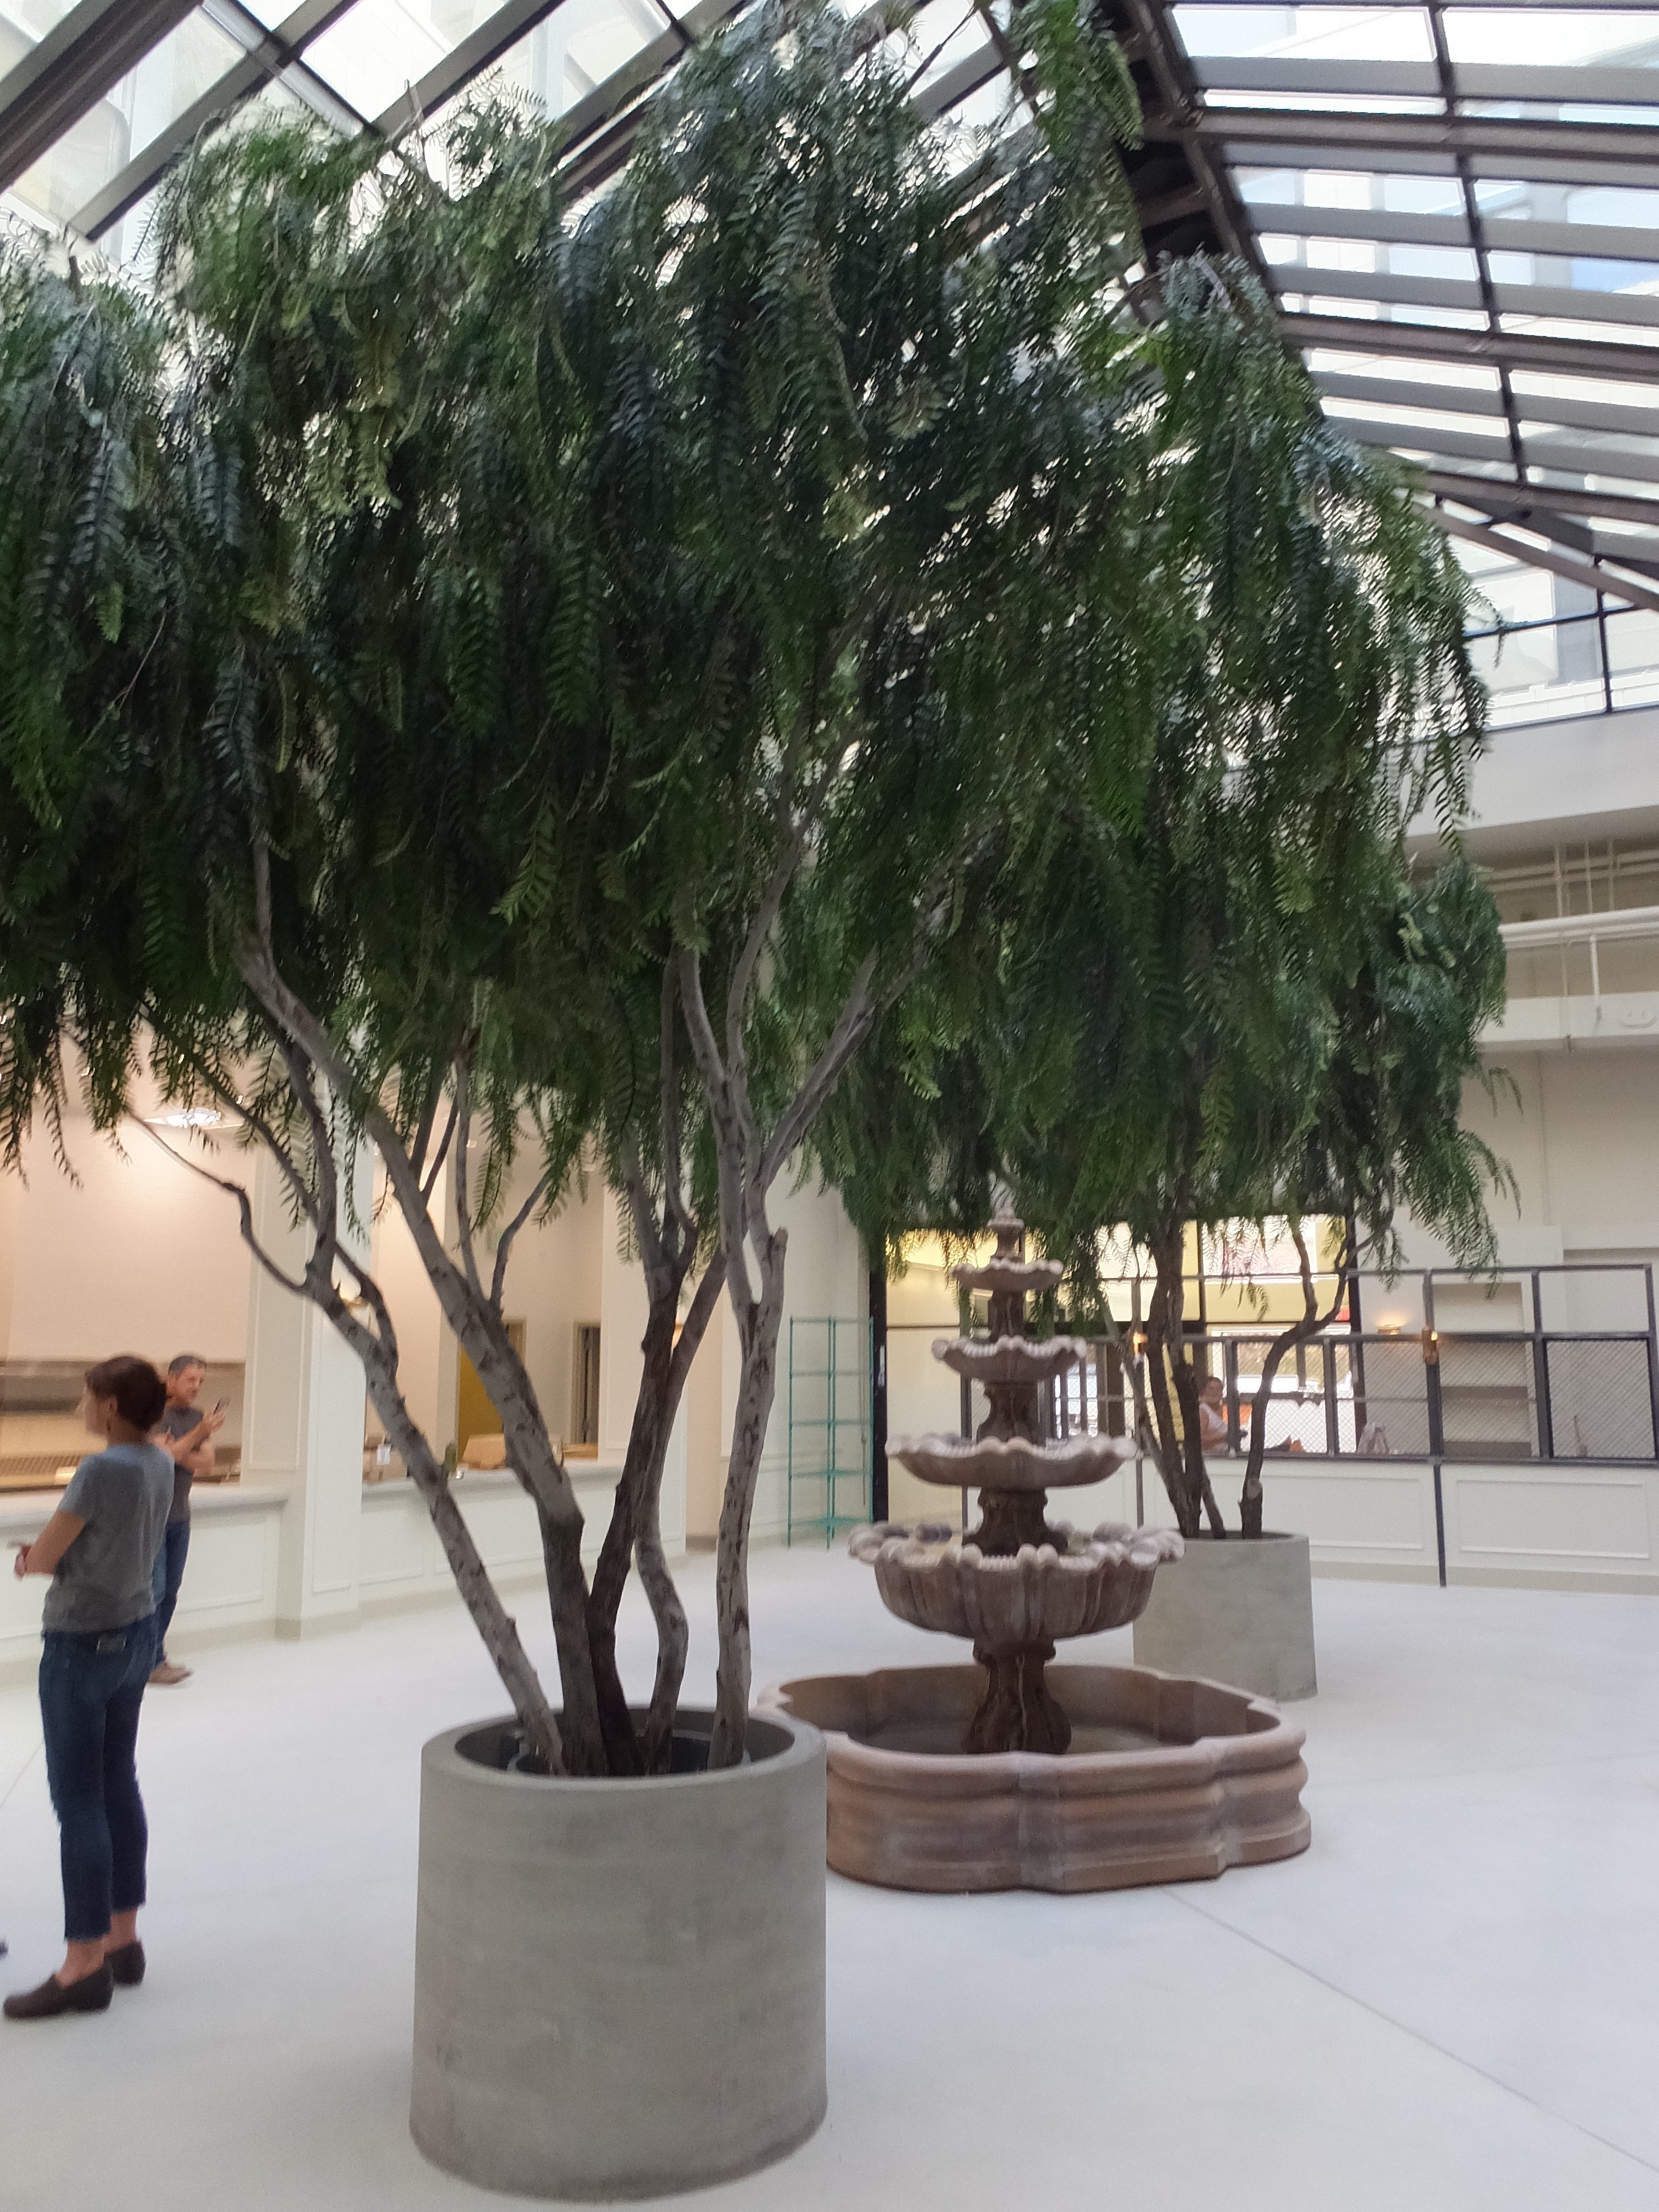 Large Artificial Trees, Life-like Specimen - Make Be-Leaves